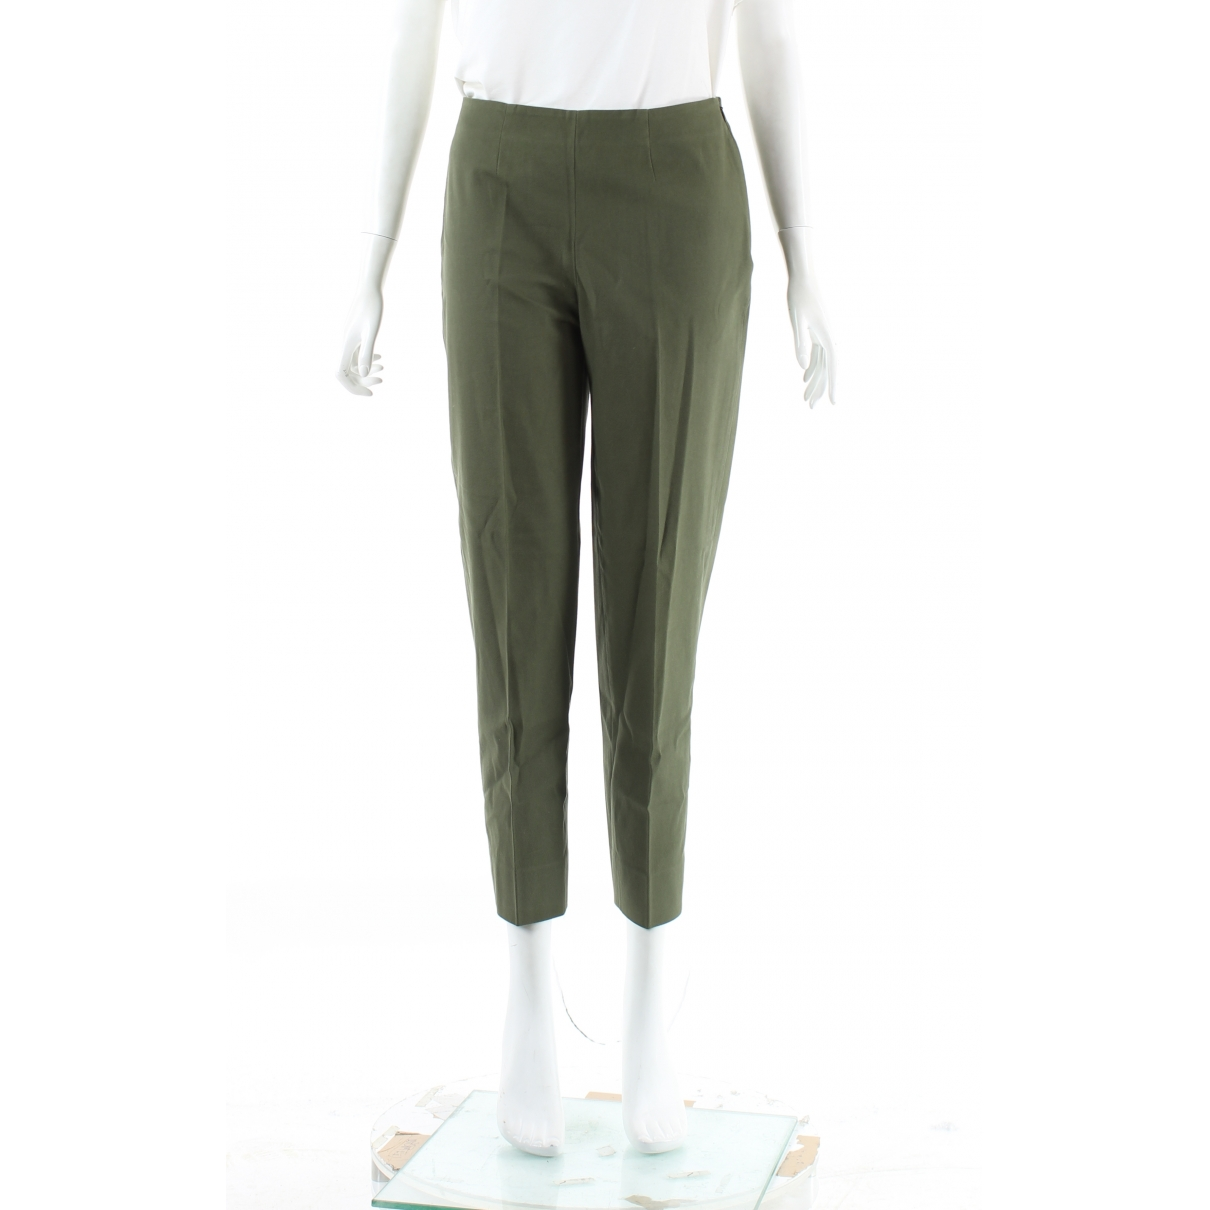 Pantalon en Algodon Caqui Autre Marque